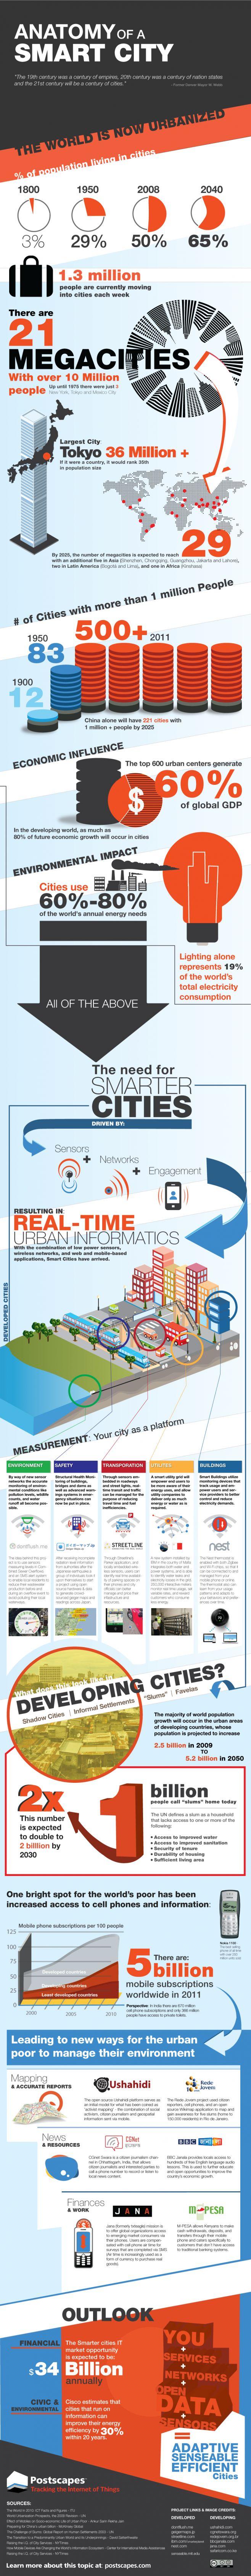 Anatomy of a Smart City / Anatomia de la Ciudad Inteligente #smartcity #infografia #infographic